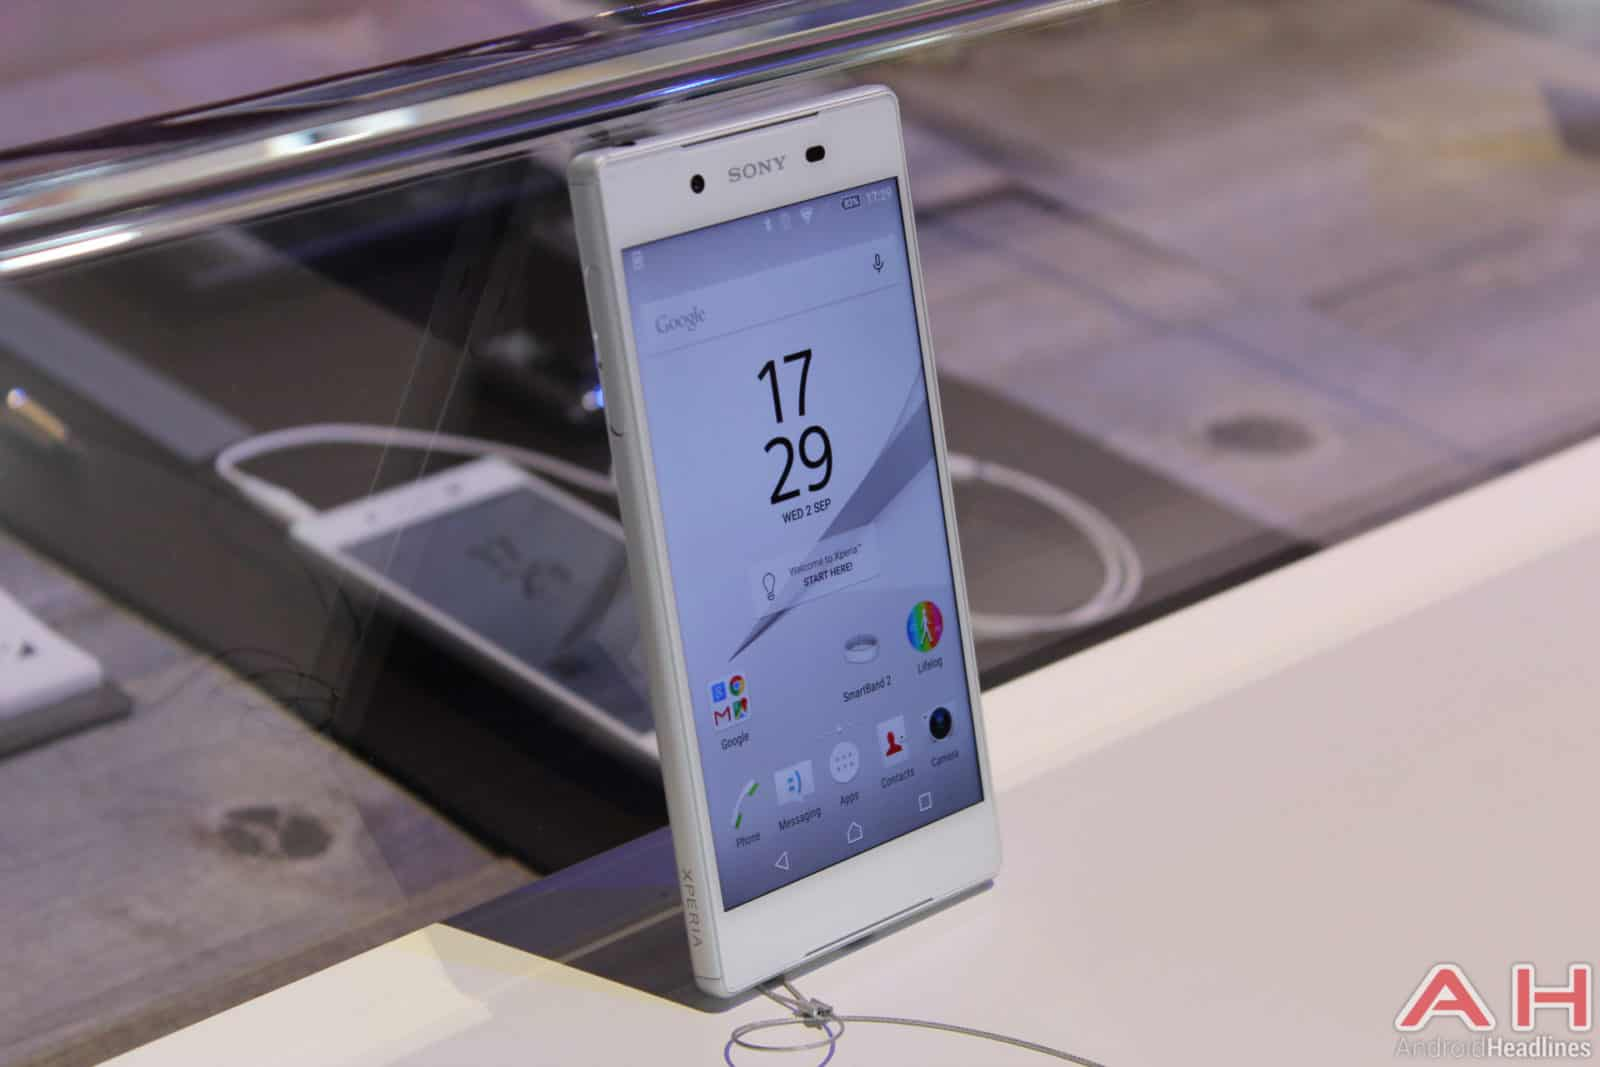 Sony Xperia Z5 IFA AH 7